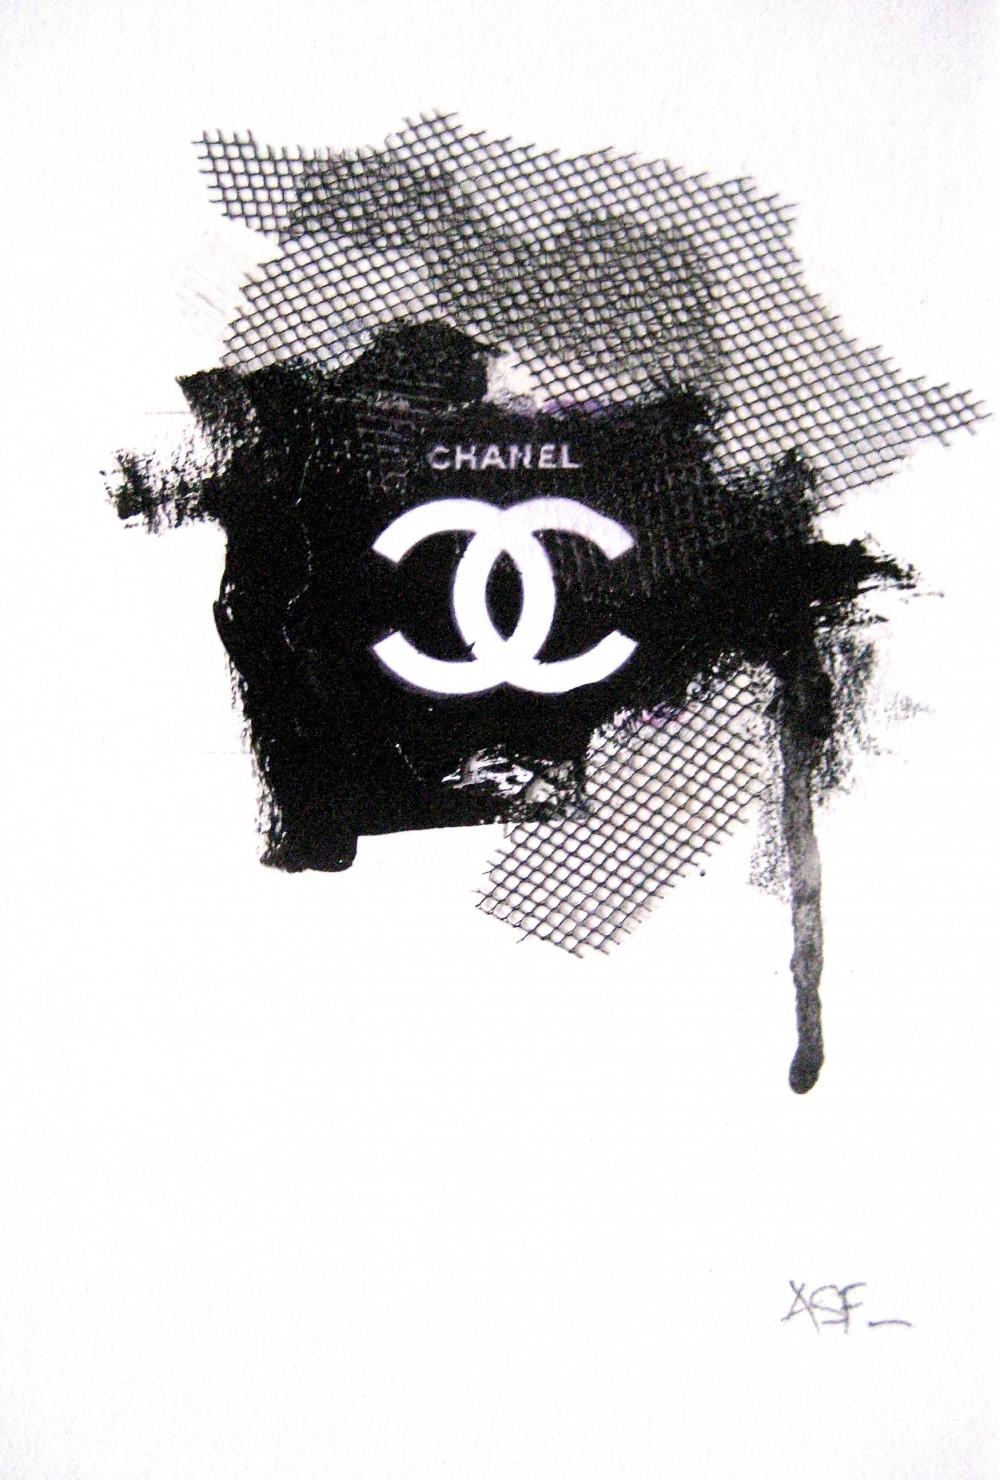 Nf Wallpaper Quotes Chanel Logo 171 Andrea Stajan Ferkul